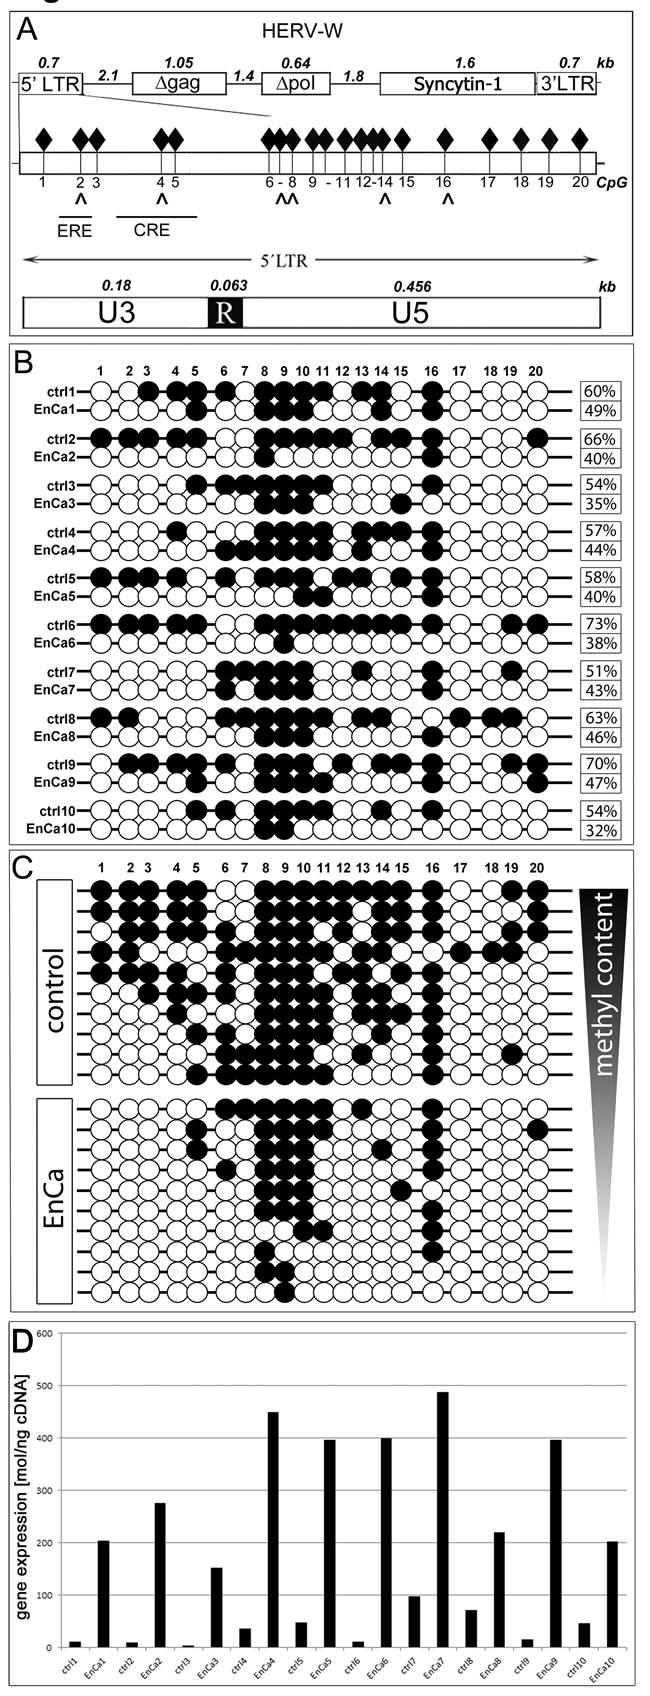 DNA methylation analysis of ERV-W 5'LTR.